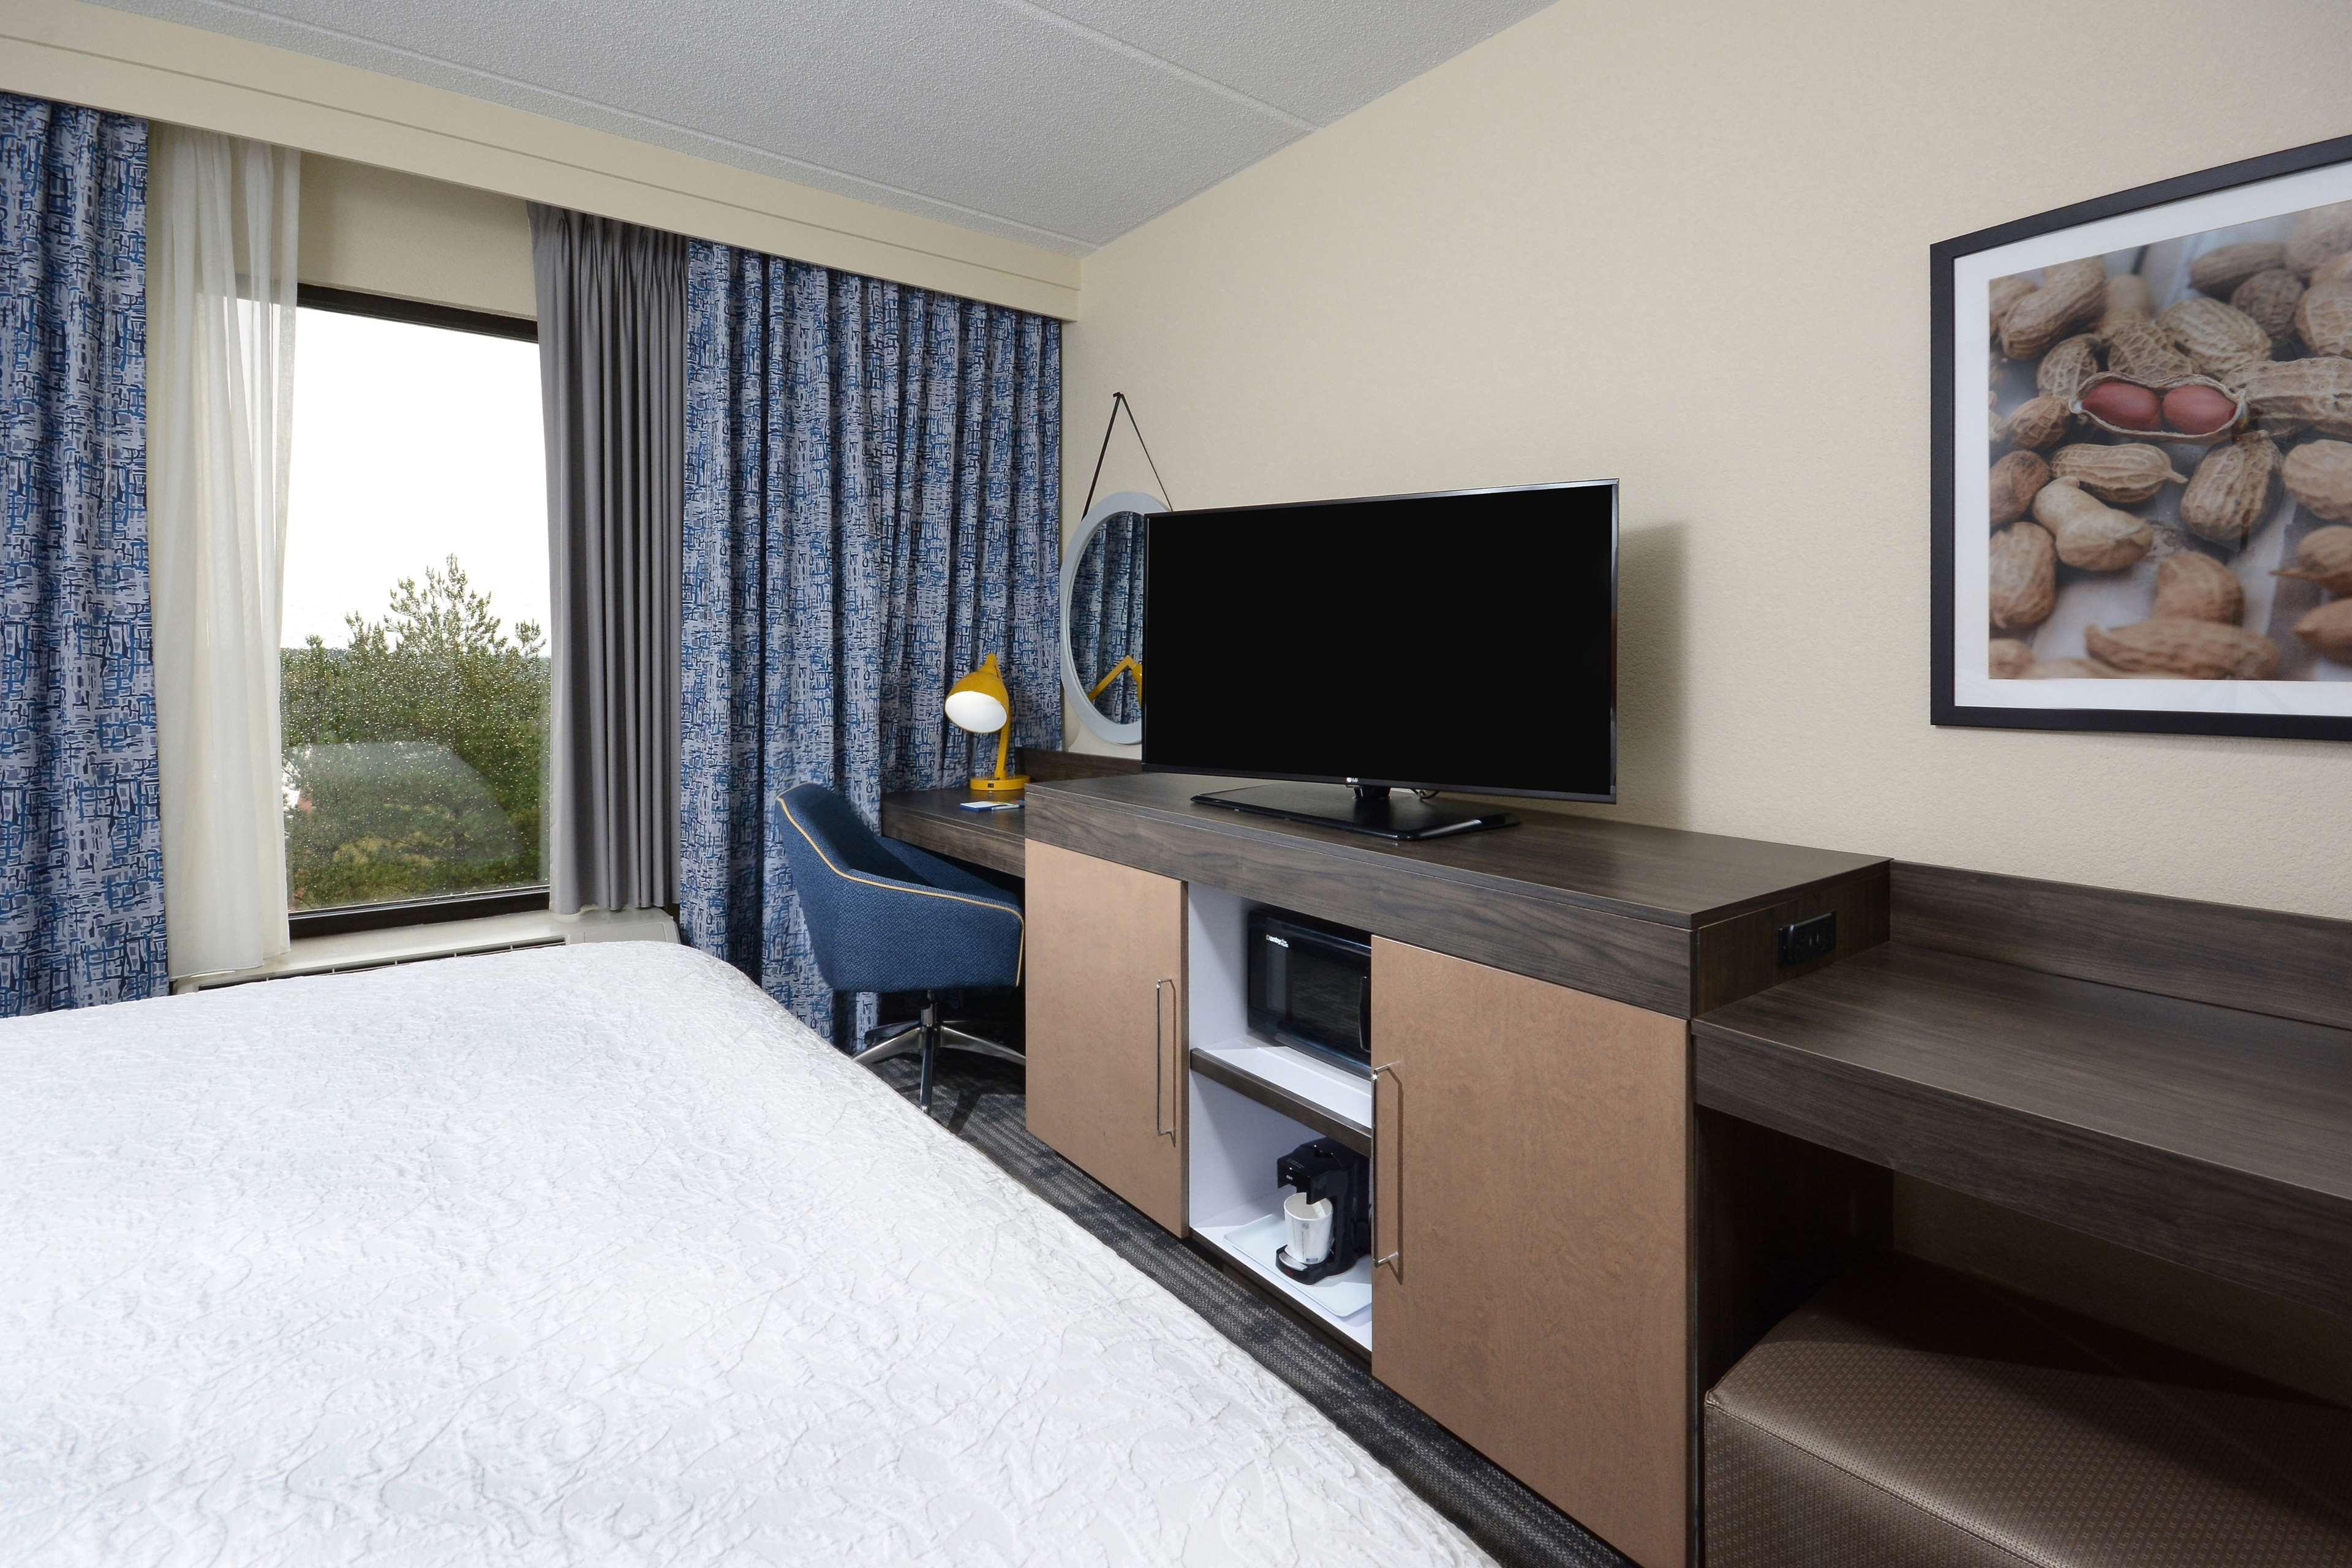 Hampton Inn & Suites Greenville/Spartanburg I-85 image 38